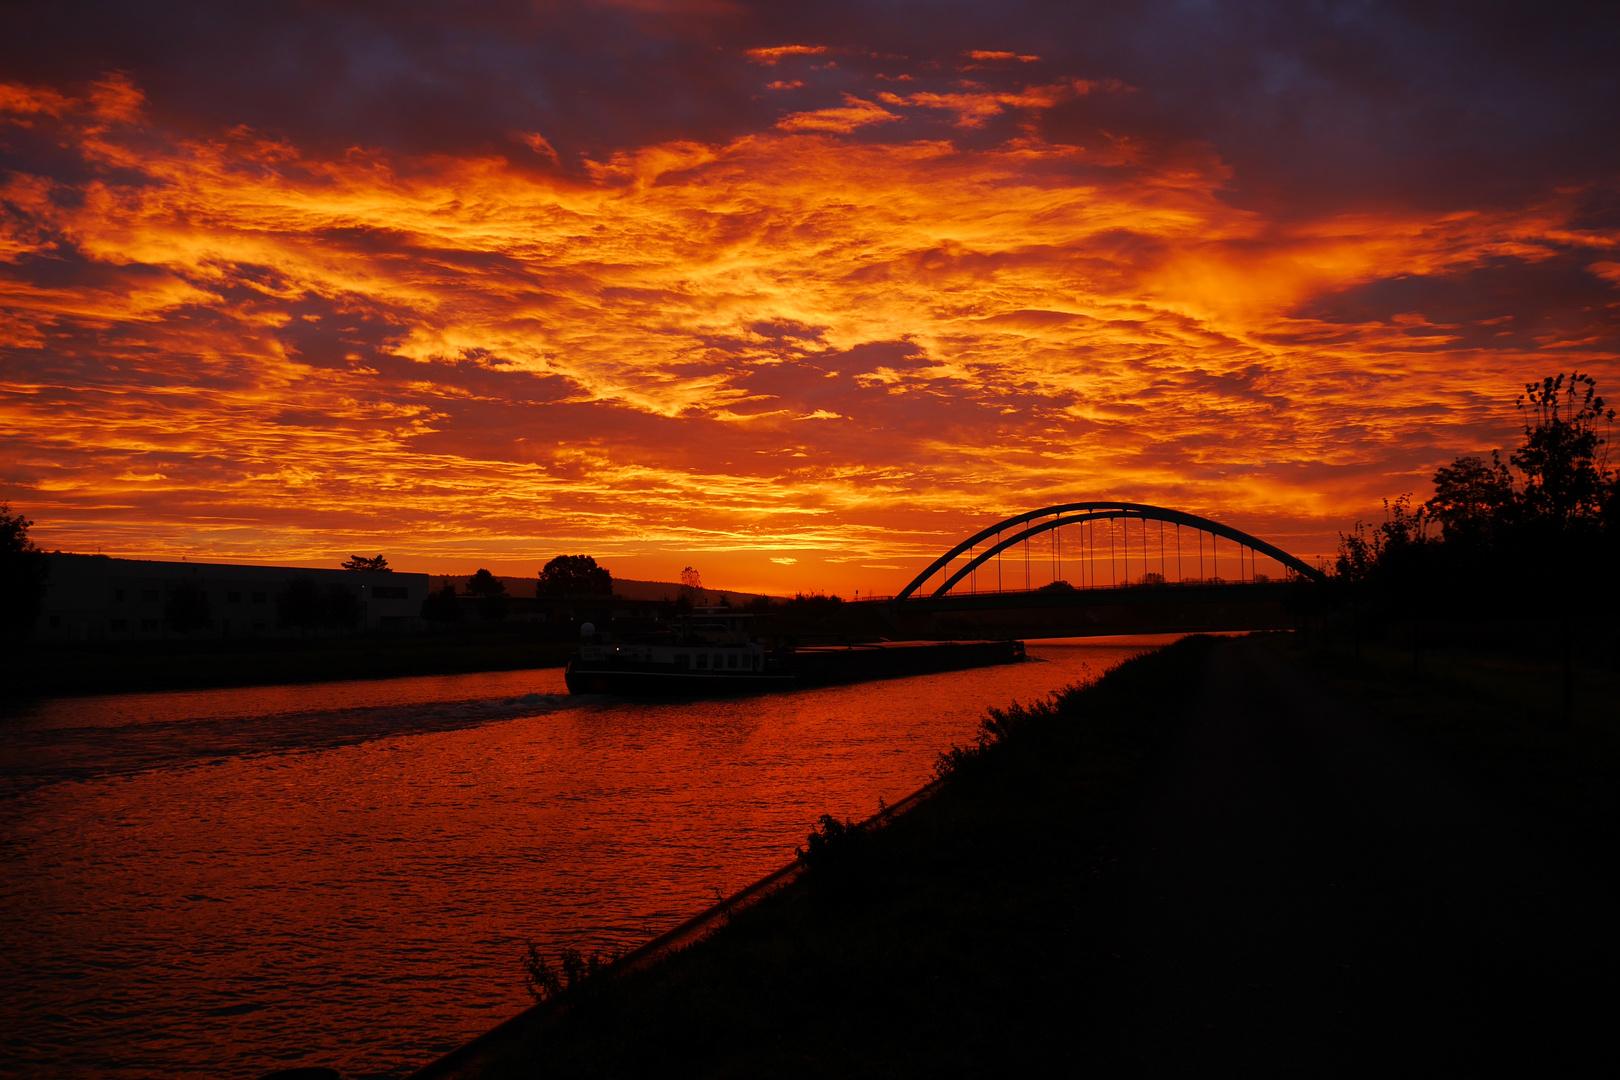 grandioser Sonnenaufgang gestern morgen..